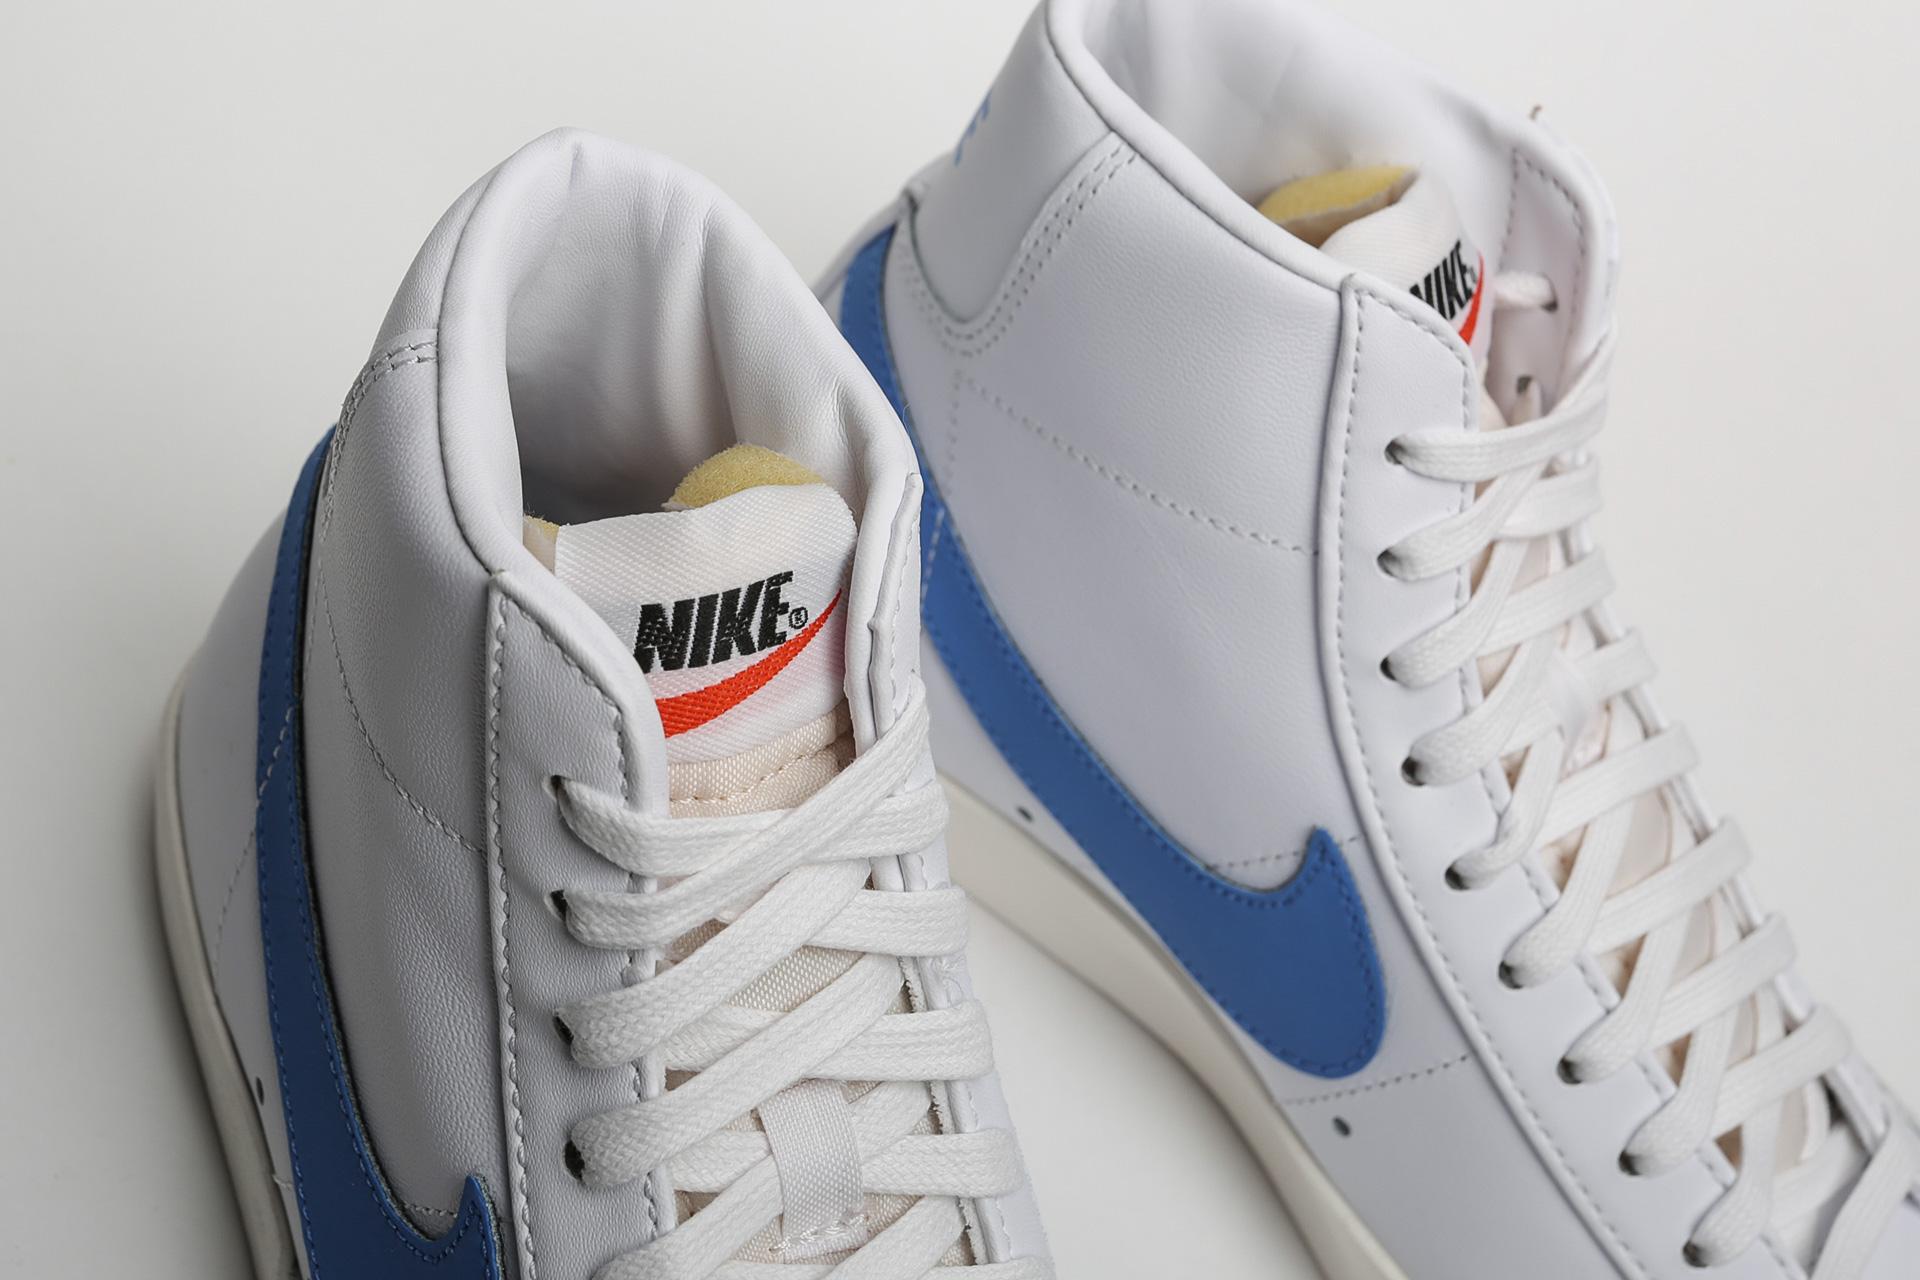 198c4f07 ... Купить белые кроссовки Nike Blazer Mid '77 Vintage - фото 5 картинки